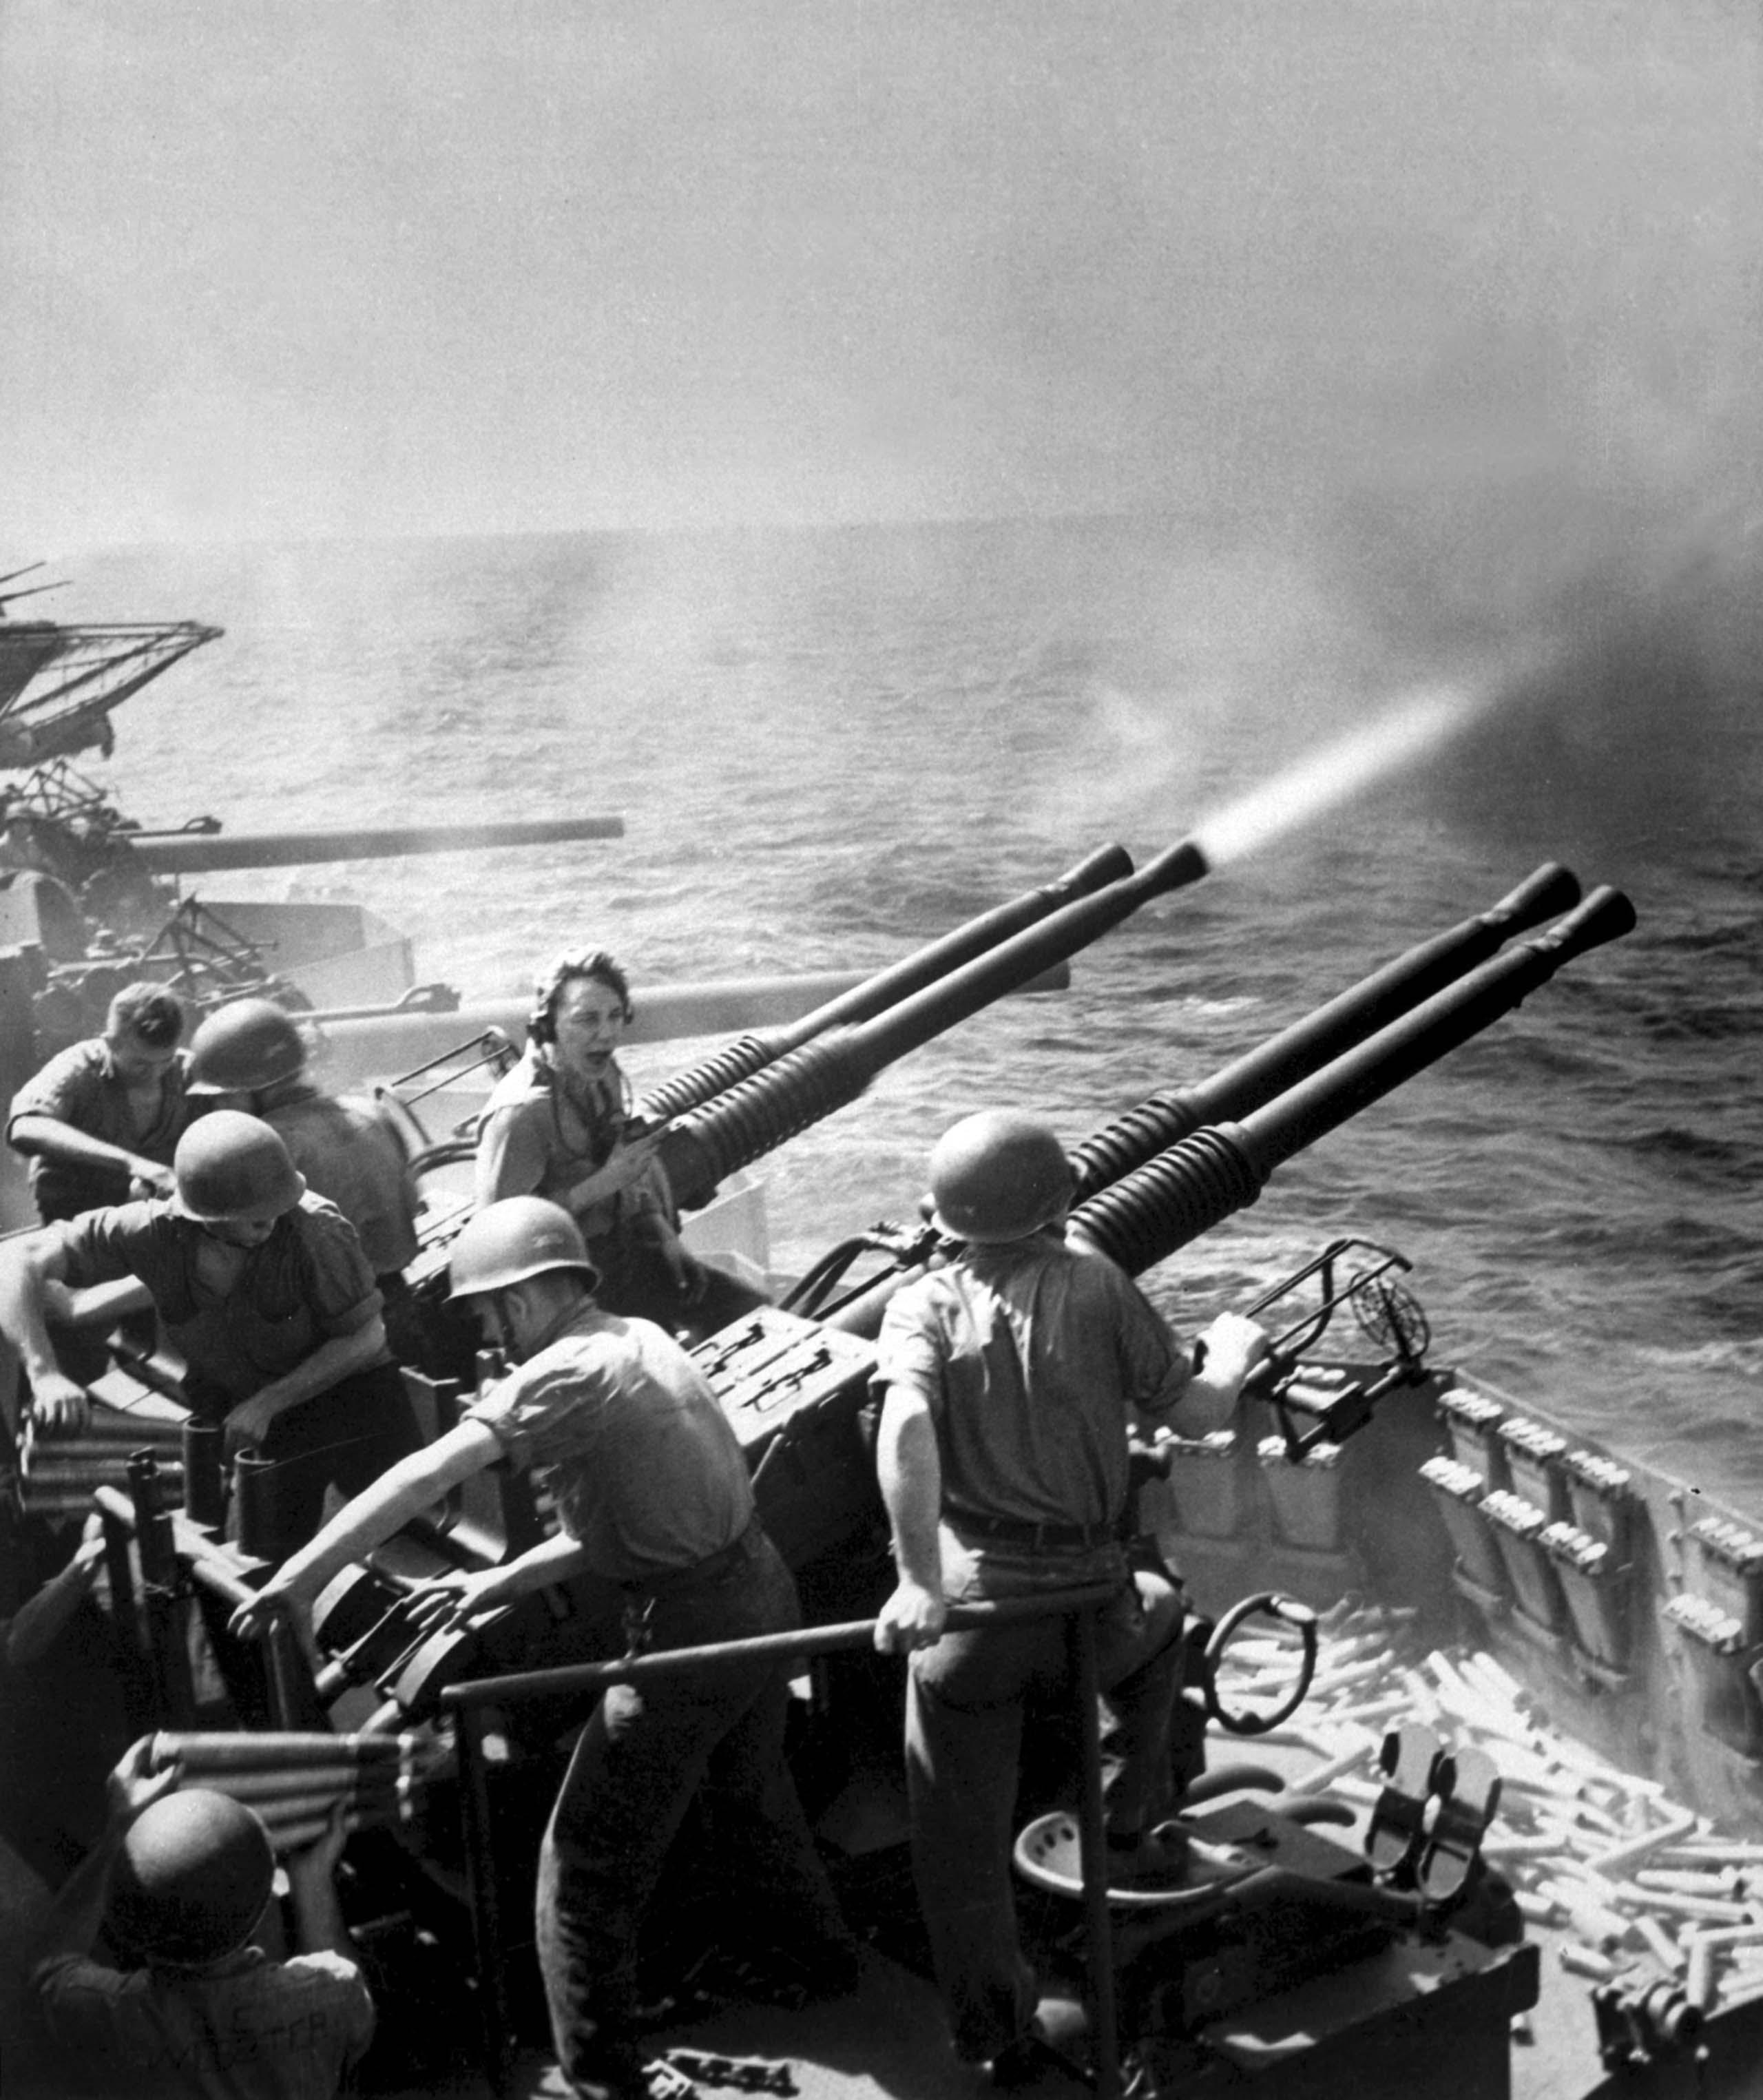 Bofors anti-aircraft guns